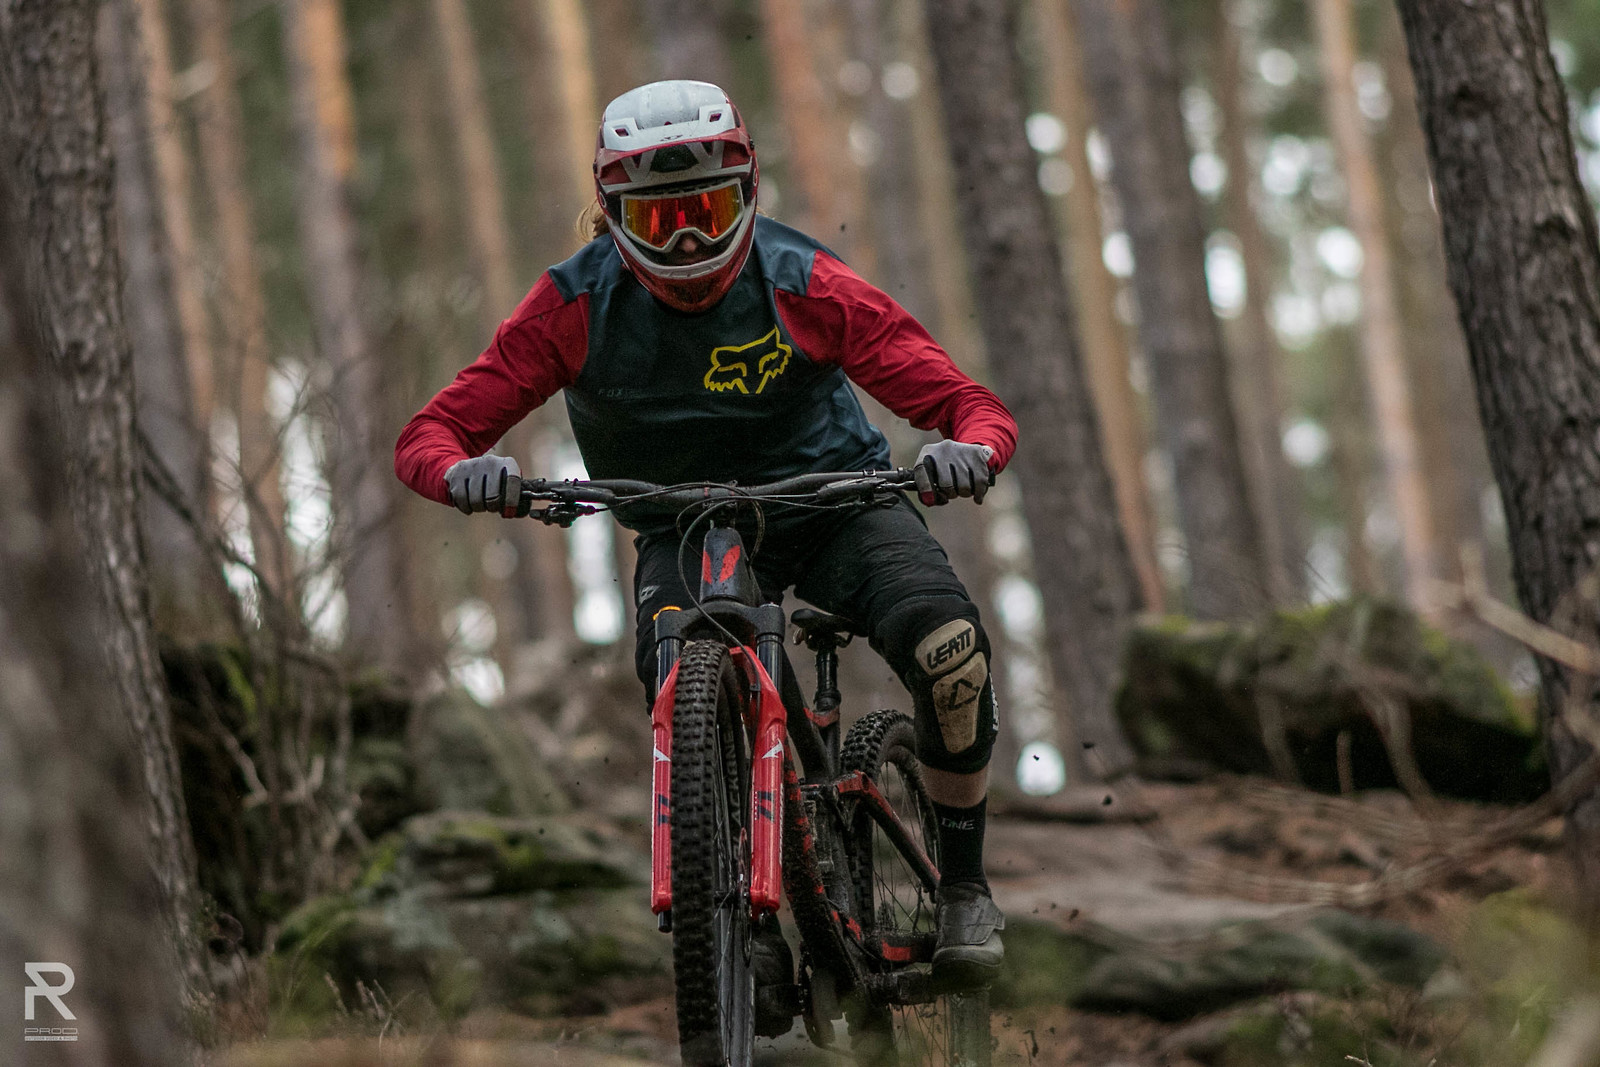 JZ4A6932 - Lucas_Bruder - Mountain Biking Pictures - Vital MTB